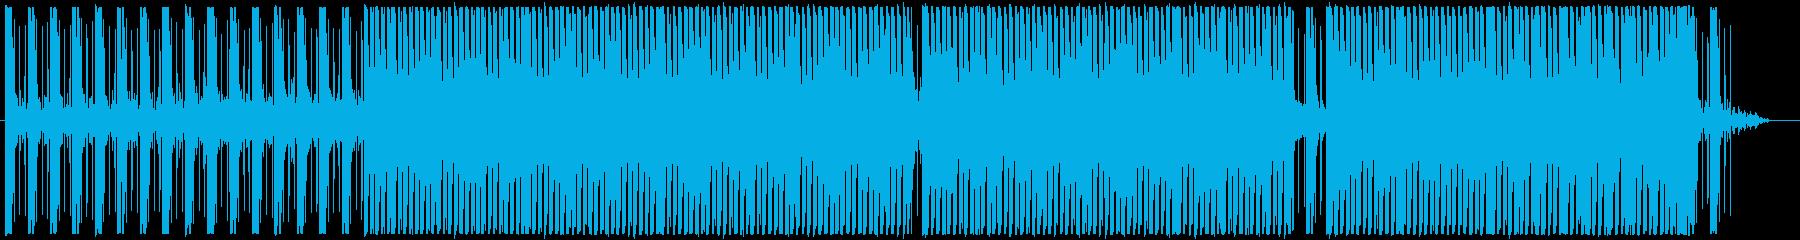 Techno01・怪しい・暗い・急ぐの再生済みの波形